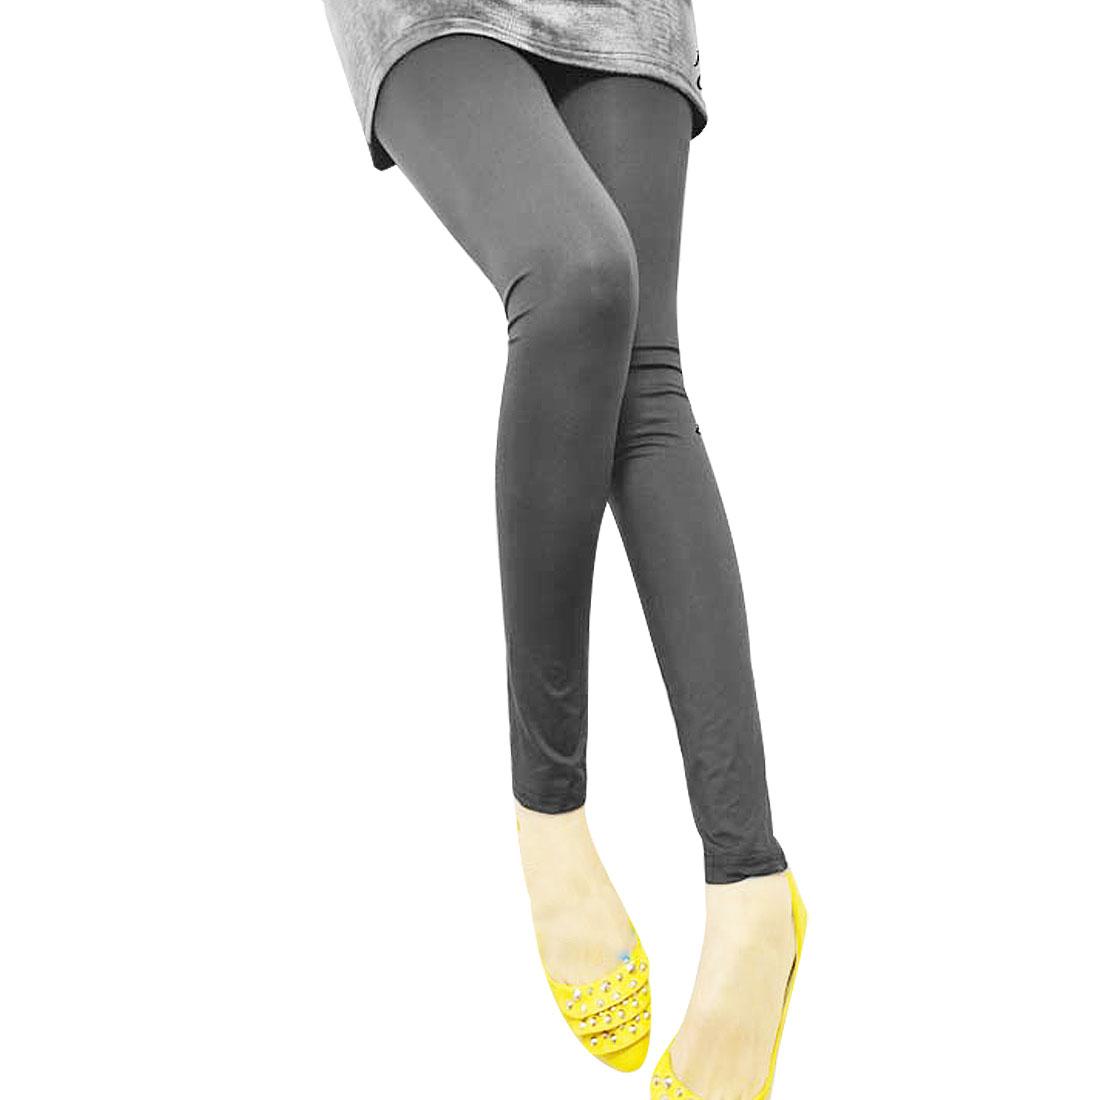 Women Dark Gray Elastic Waist Close-fitting Leggings Pants XS